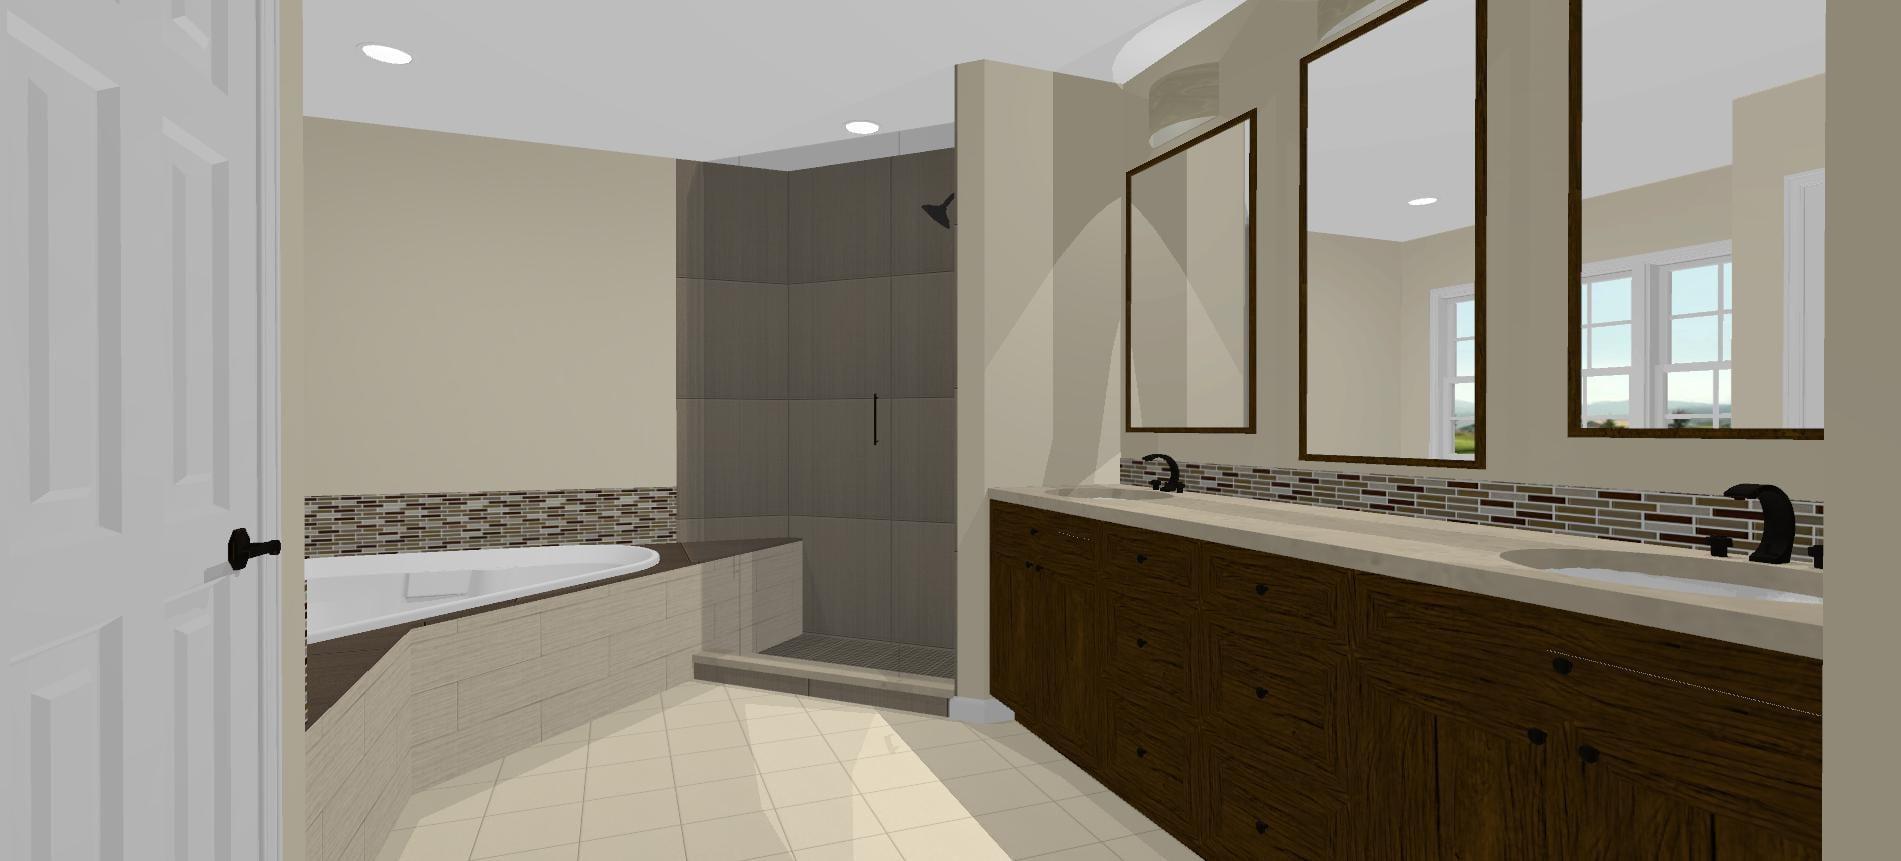 Design-build bathroom remodel in Frederick - Talon ...